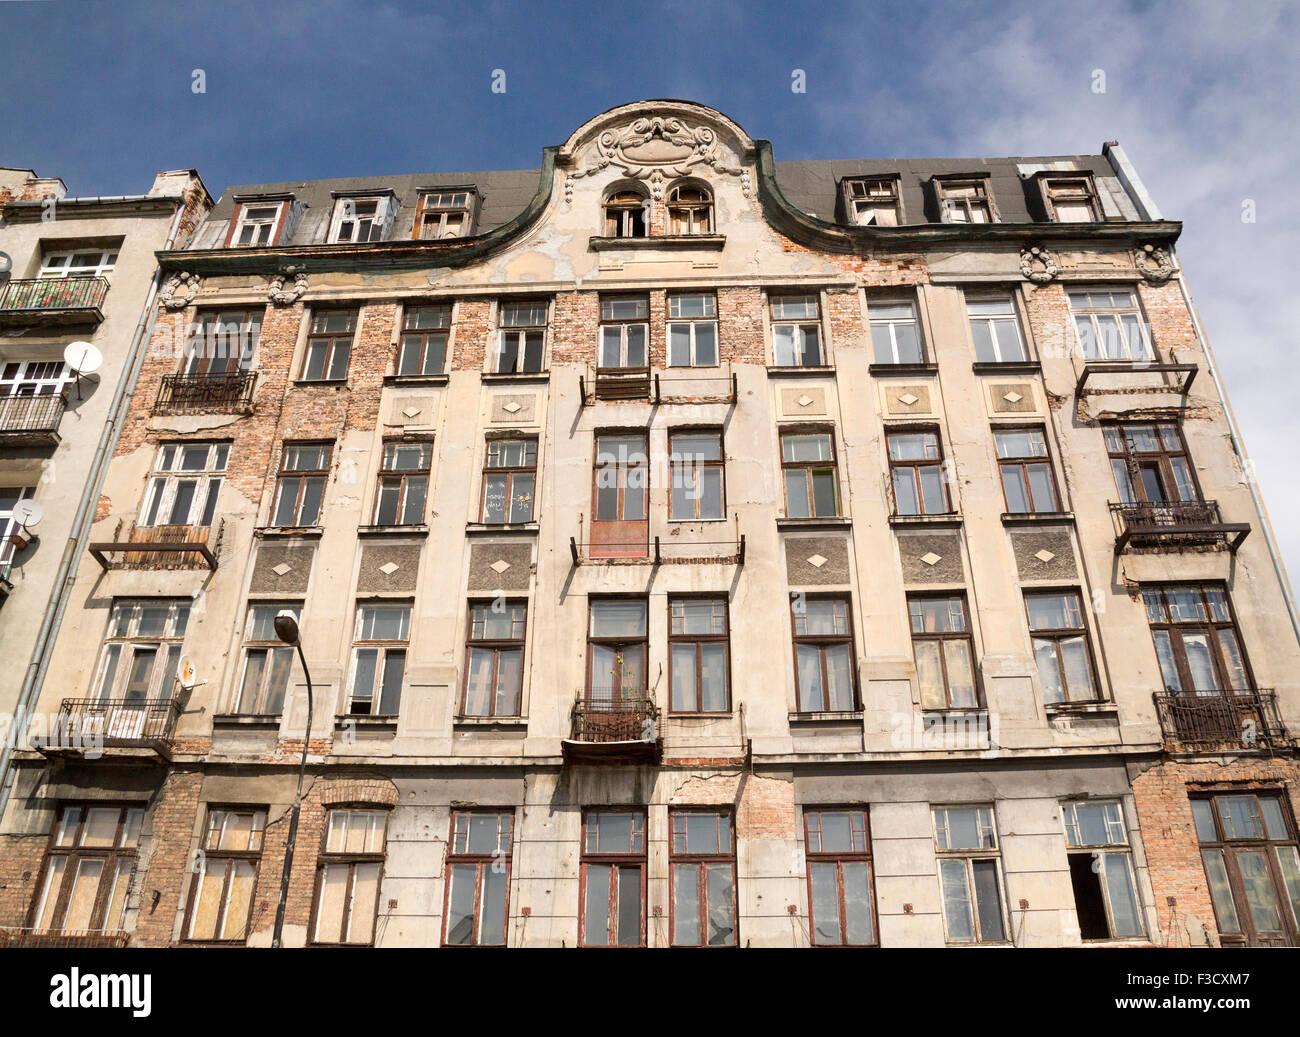 Poland Warsaw Praga district and run-down apartment building - Stock Image